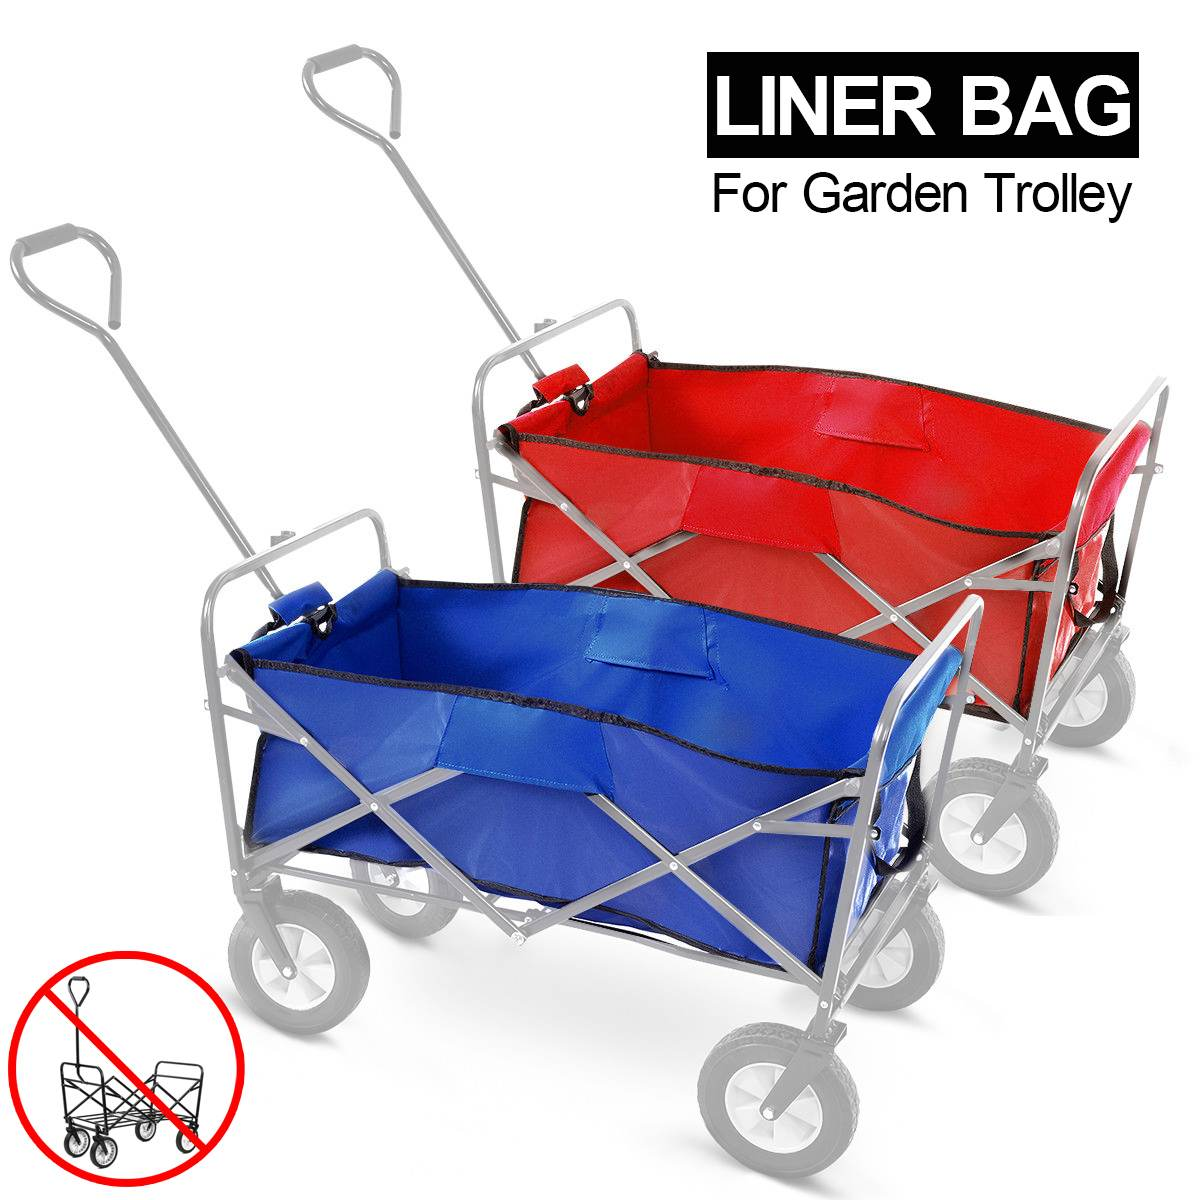 Portable Luggage Cart Bag 4 Wheel Heavy Duty Folding Bag Garden Trolley Cart Bag Bolderkar Wagon cart Only Bag Cart not includedPortable Luggage Cart Bag 4 Wheel Heavy Duty Folding Bag Garden Trolley Cart Bag Bolderkar Wagon cart Only Bag Cart not included